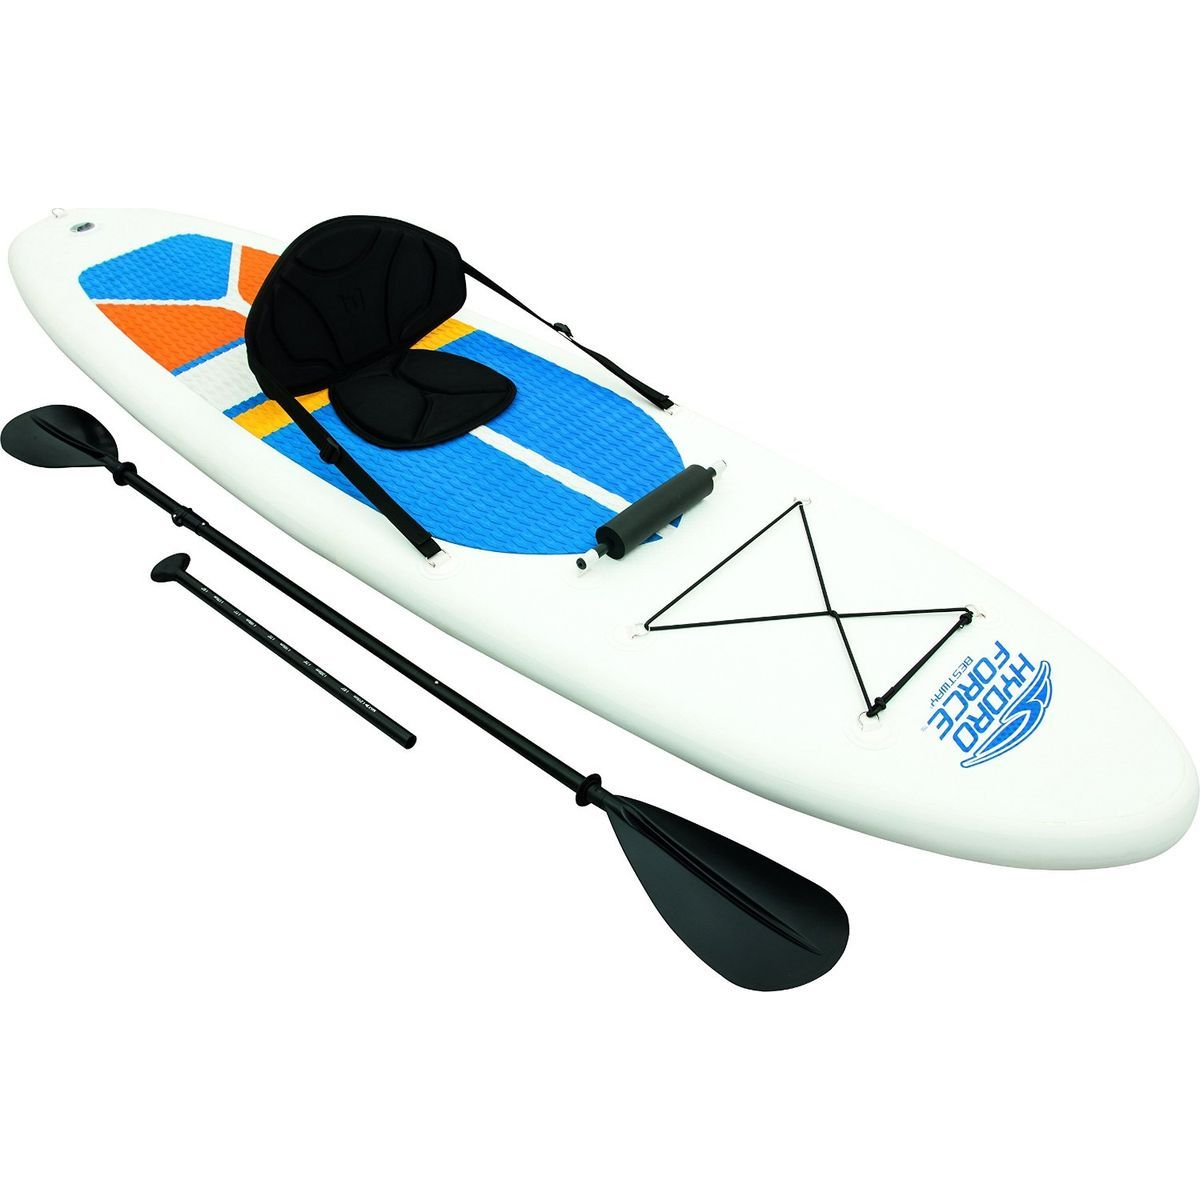 Bestway Paddle White Cap SUP 305 x 81 x 10 cm